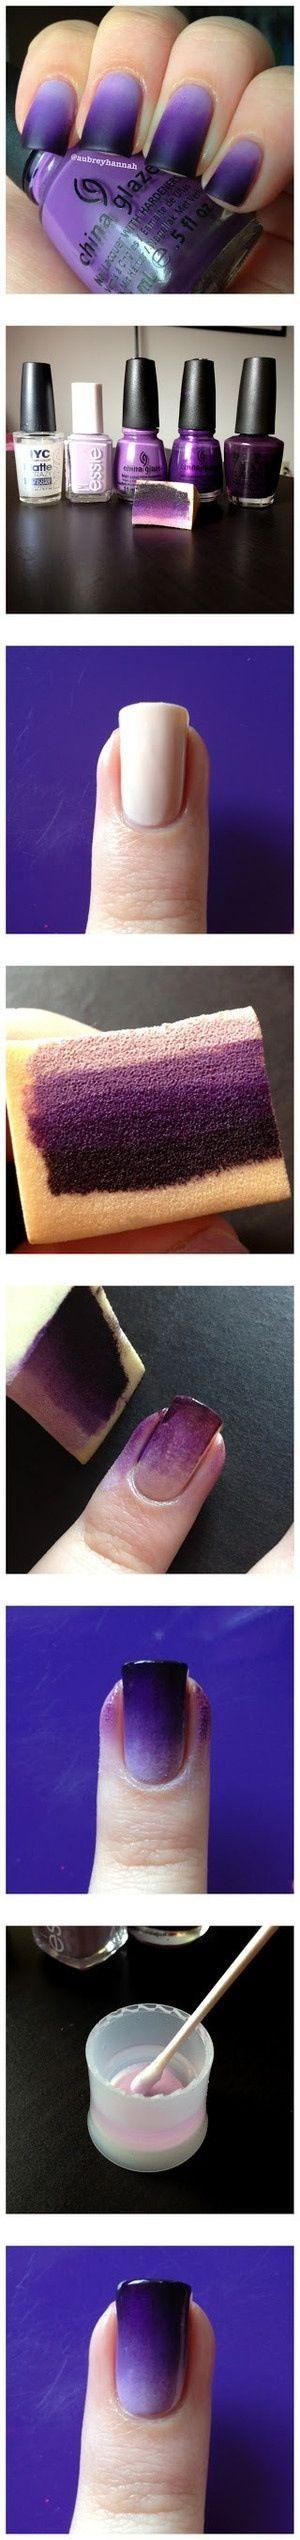 Sponge nail art. Love the color